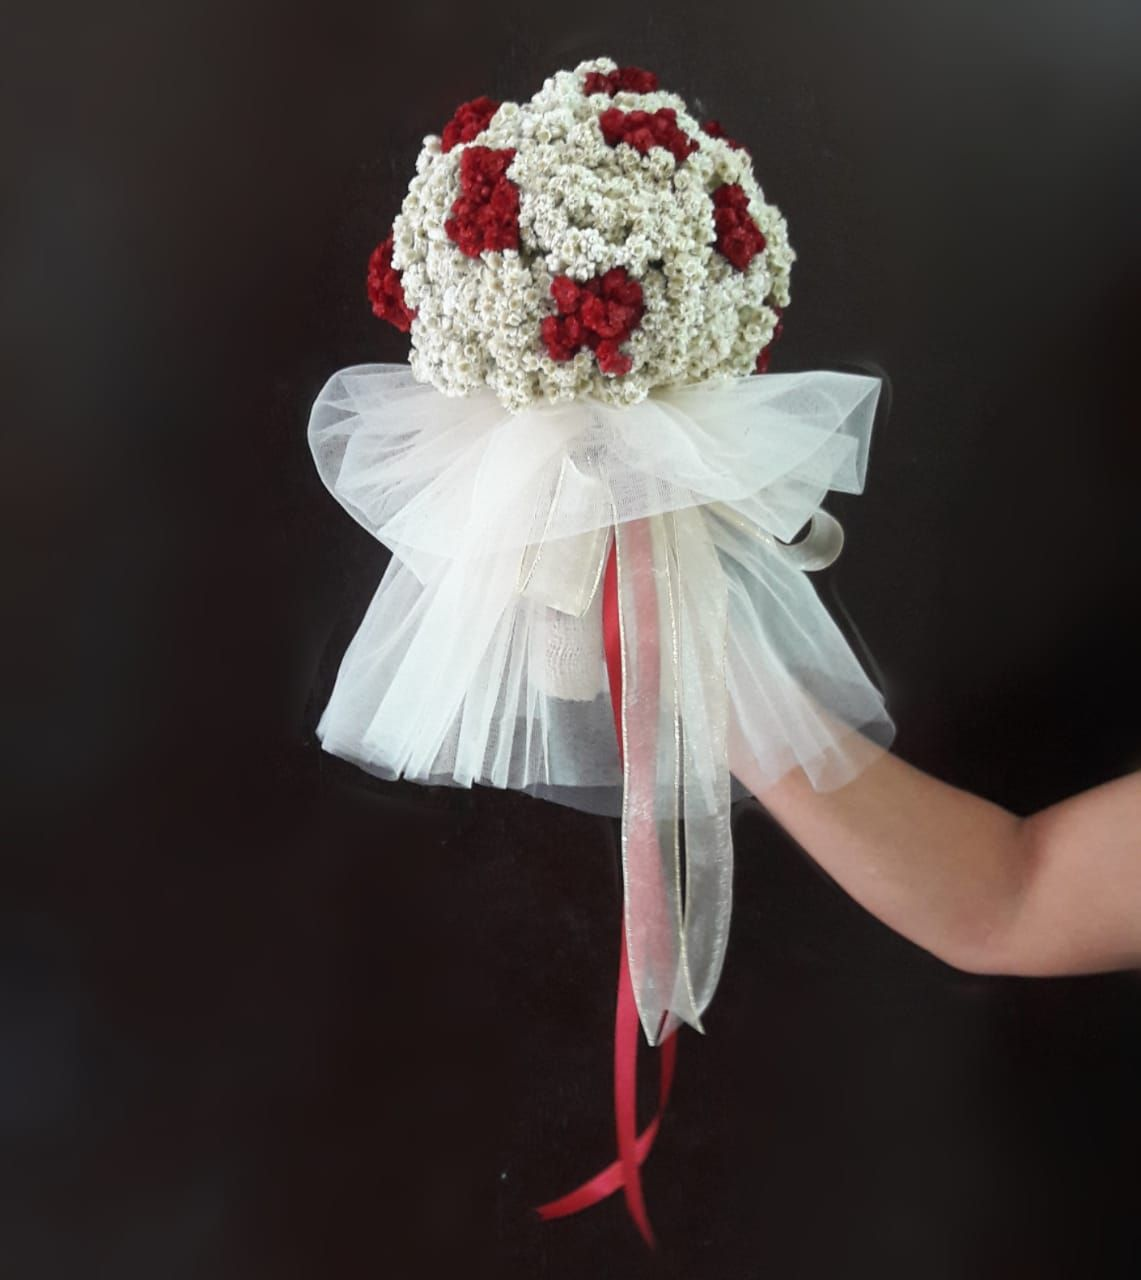 Bunga Edelweis Bunga Abadi Tipe Bunga Edelweis Buket Wedding Eksklusif Cocok Sebagai Kado Unik Untuk Pasangan Atau Sahabat Anda Laki L Buket Bunga Pernikahan